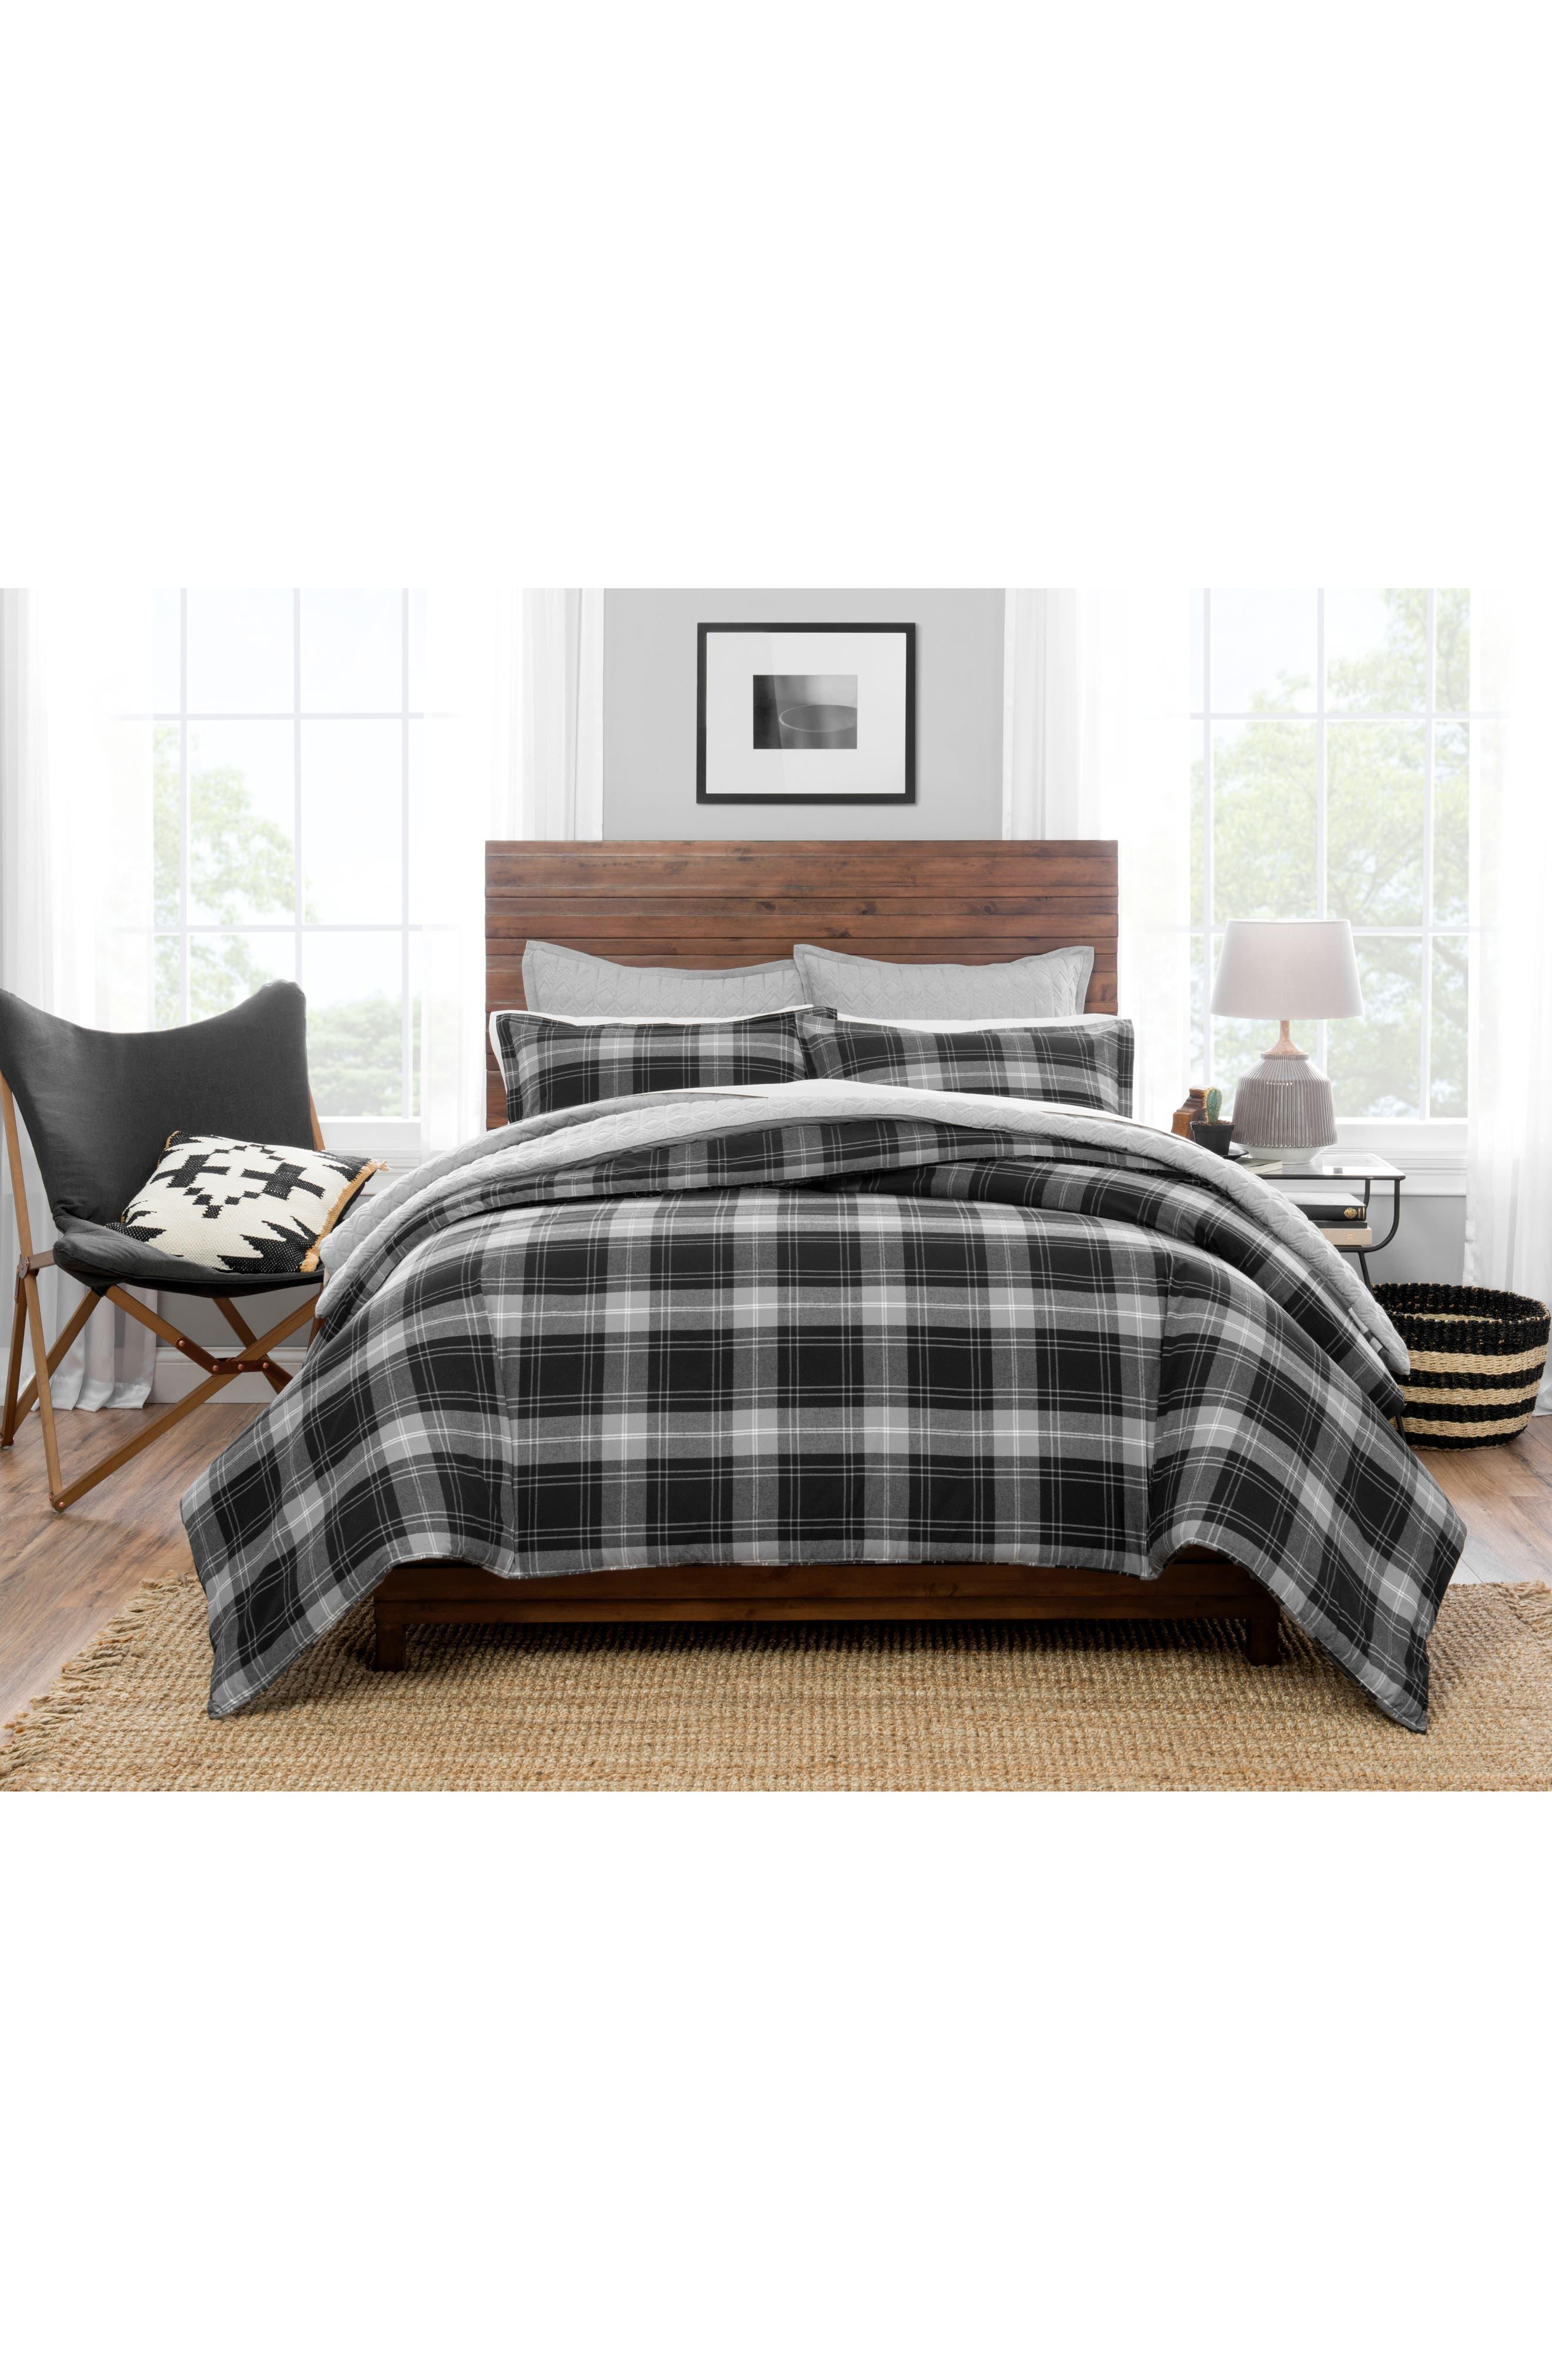 Alternate Image 1 Selected - Pendleton Plaid Comforter & Sham Set